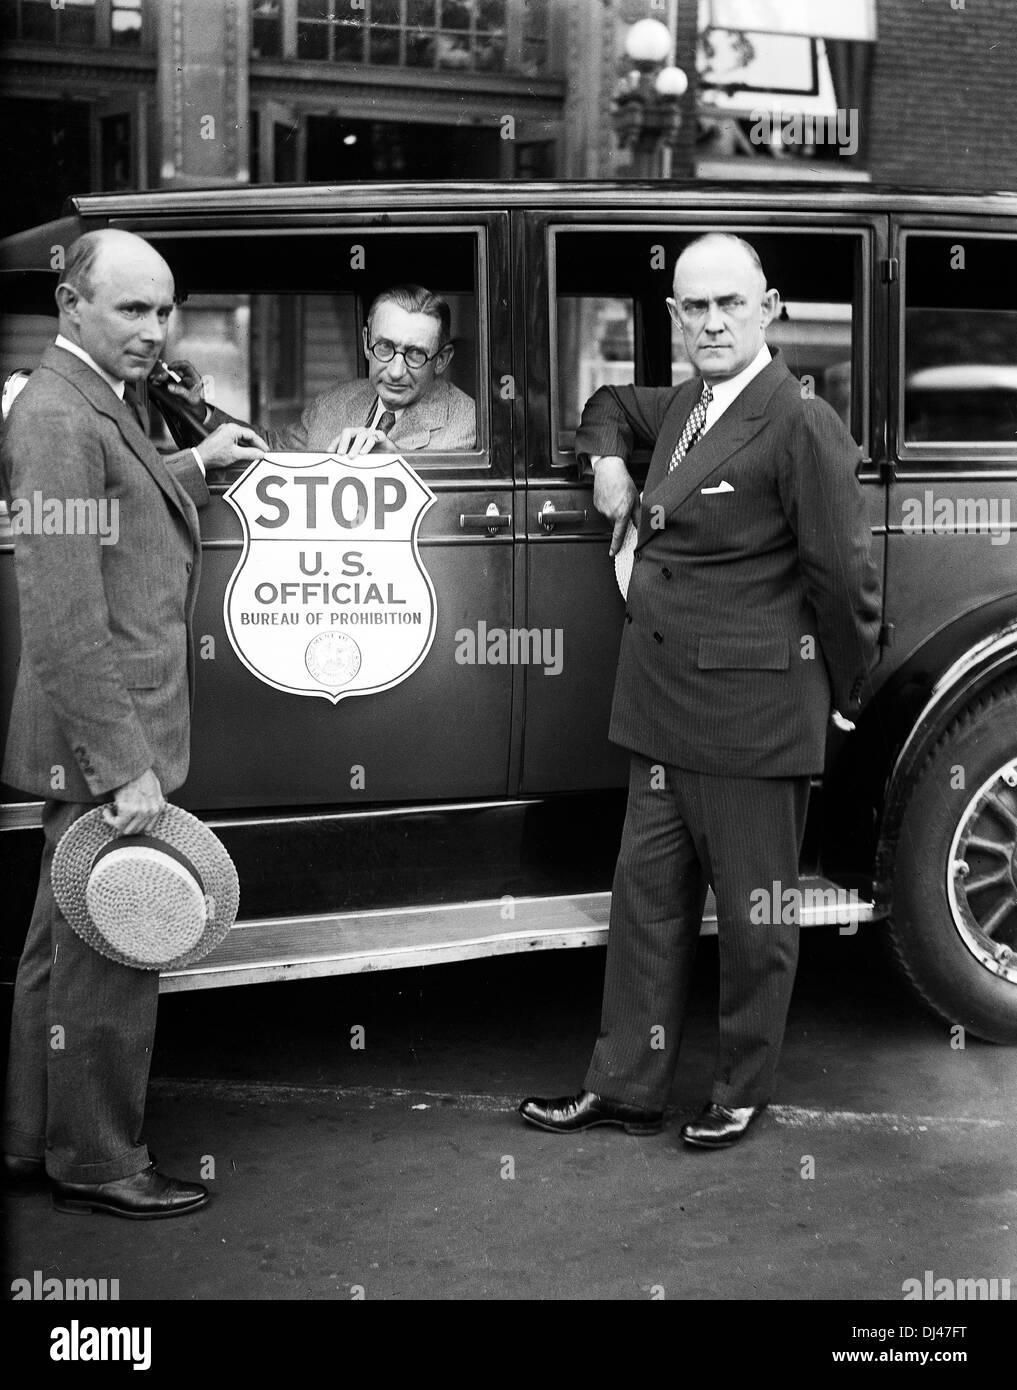 Bureau of Prohibition, USA, Prohibition Administrator Ames Woodcock, left - Stock Image